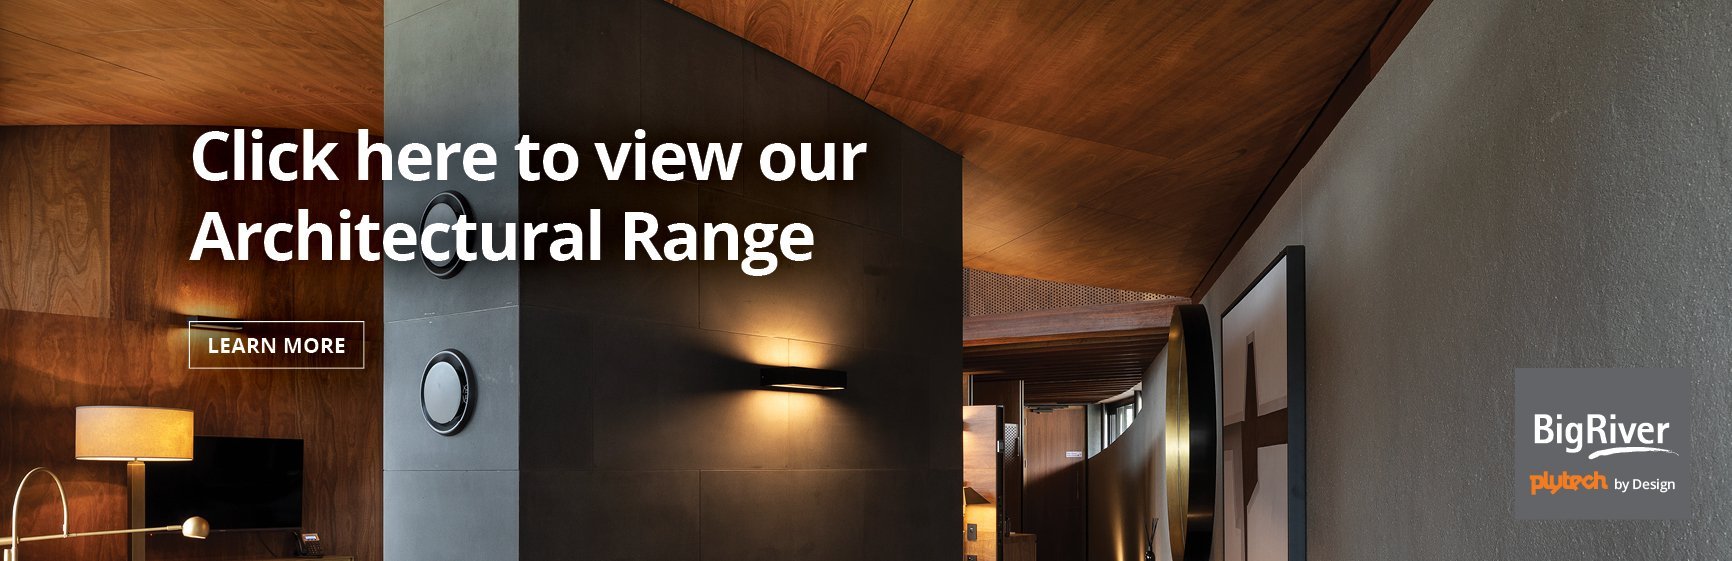 Architectural Range